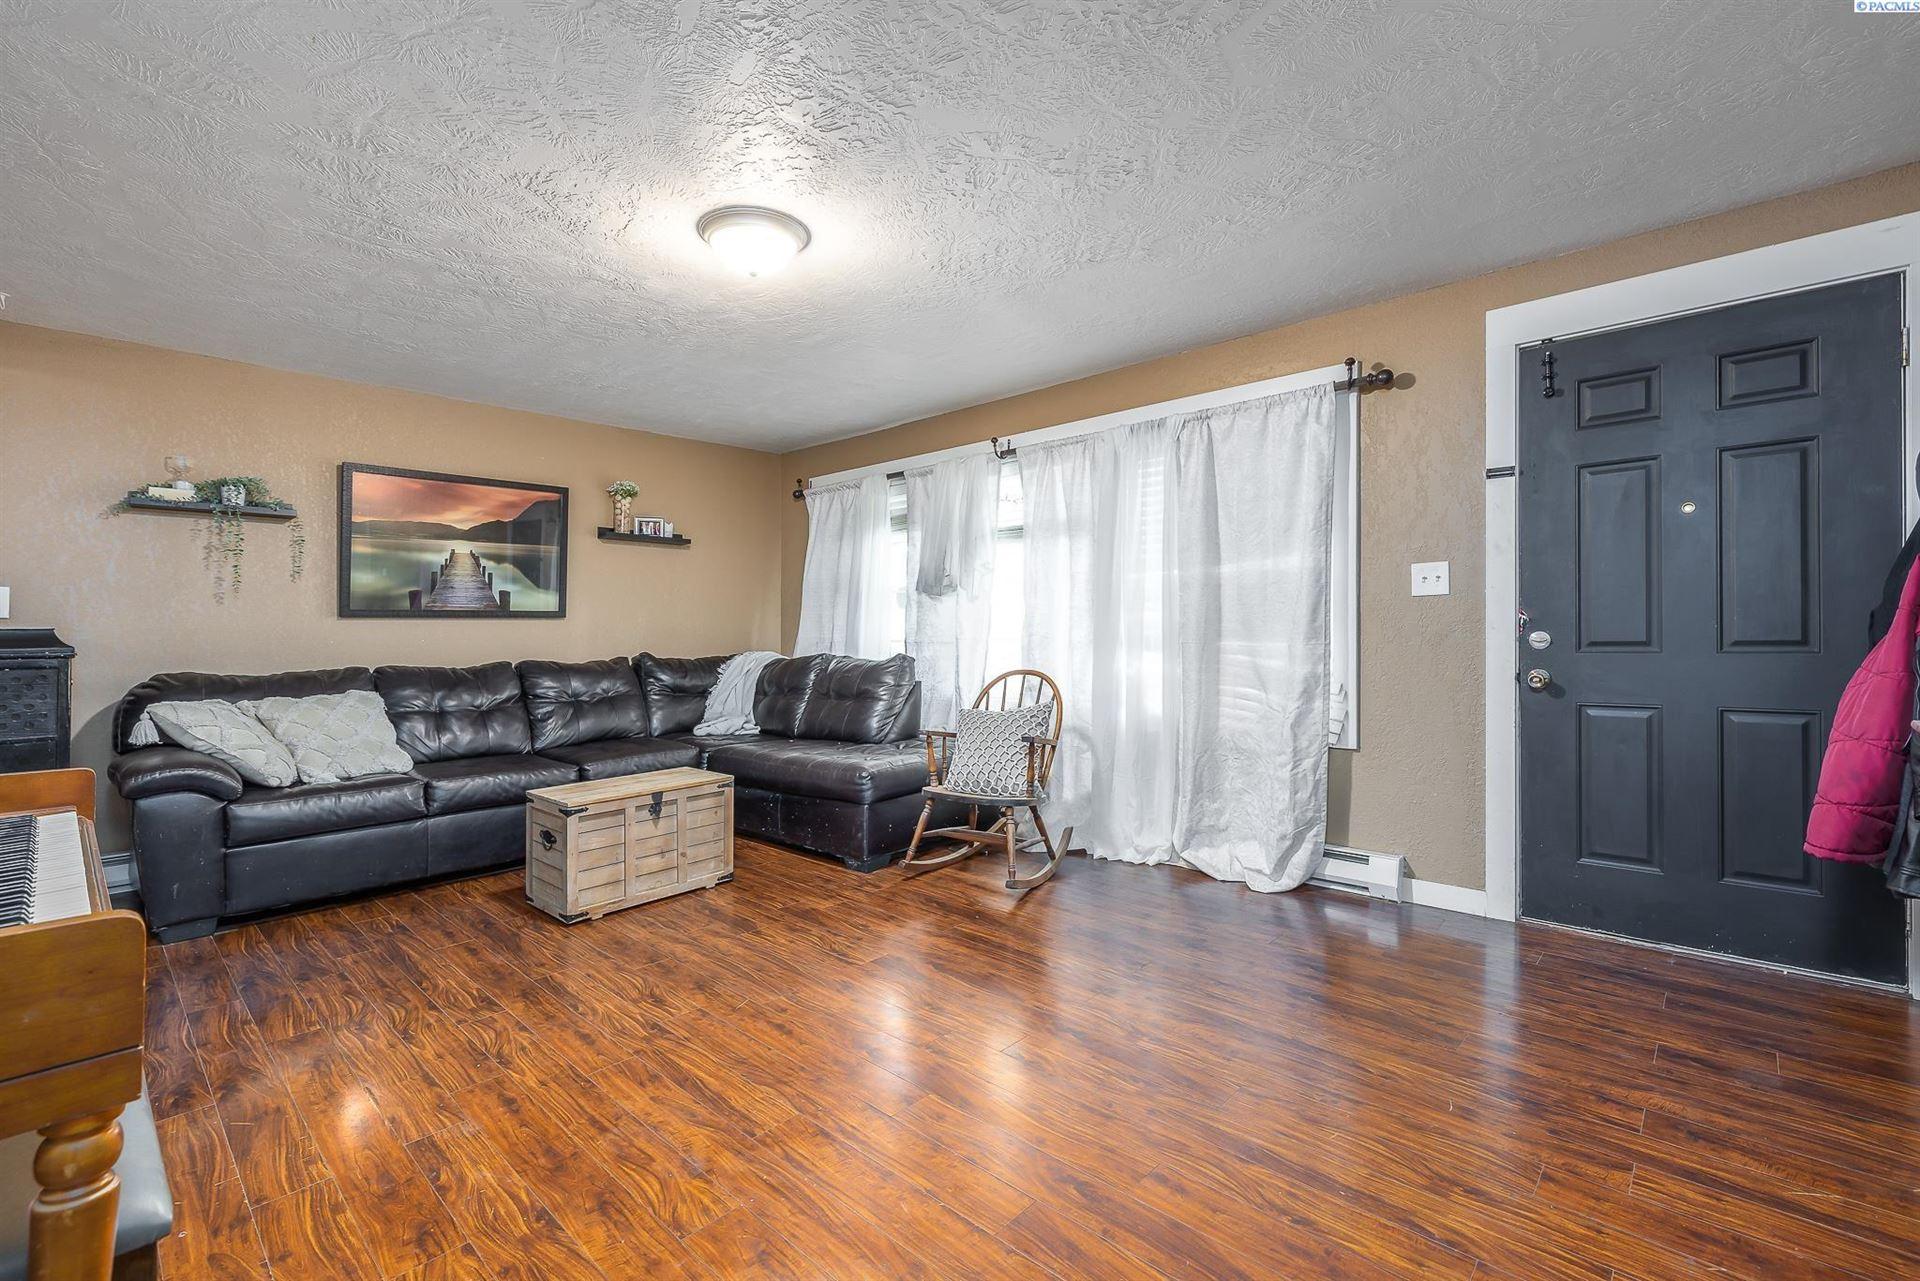 Photo of 203 S Anderson Street, Kennewick, WA 99336 (MLS # 257431)